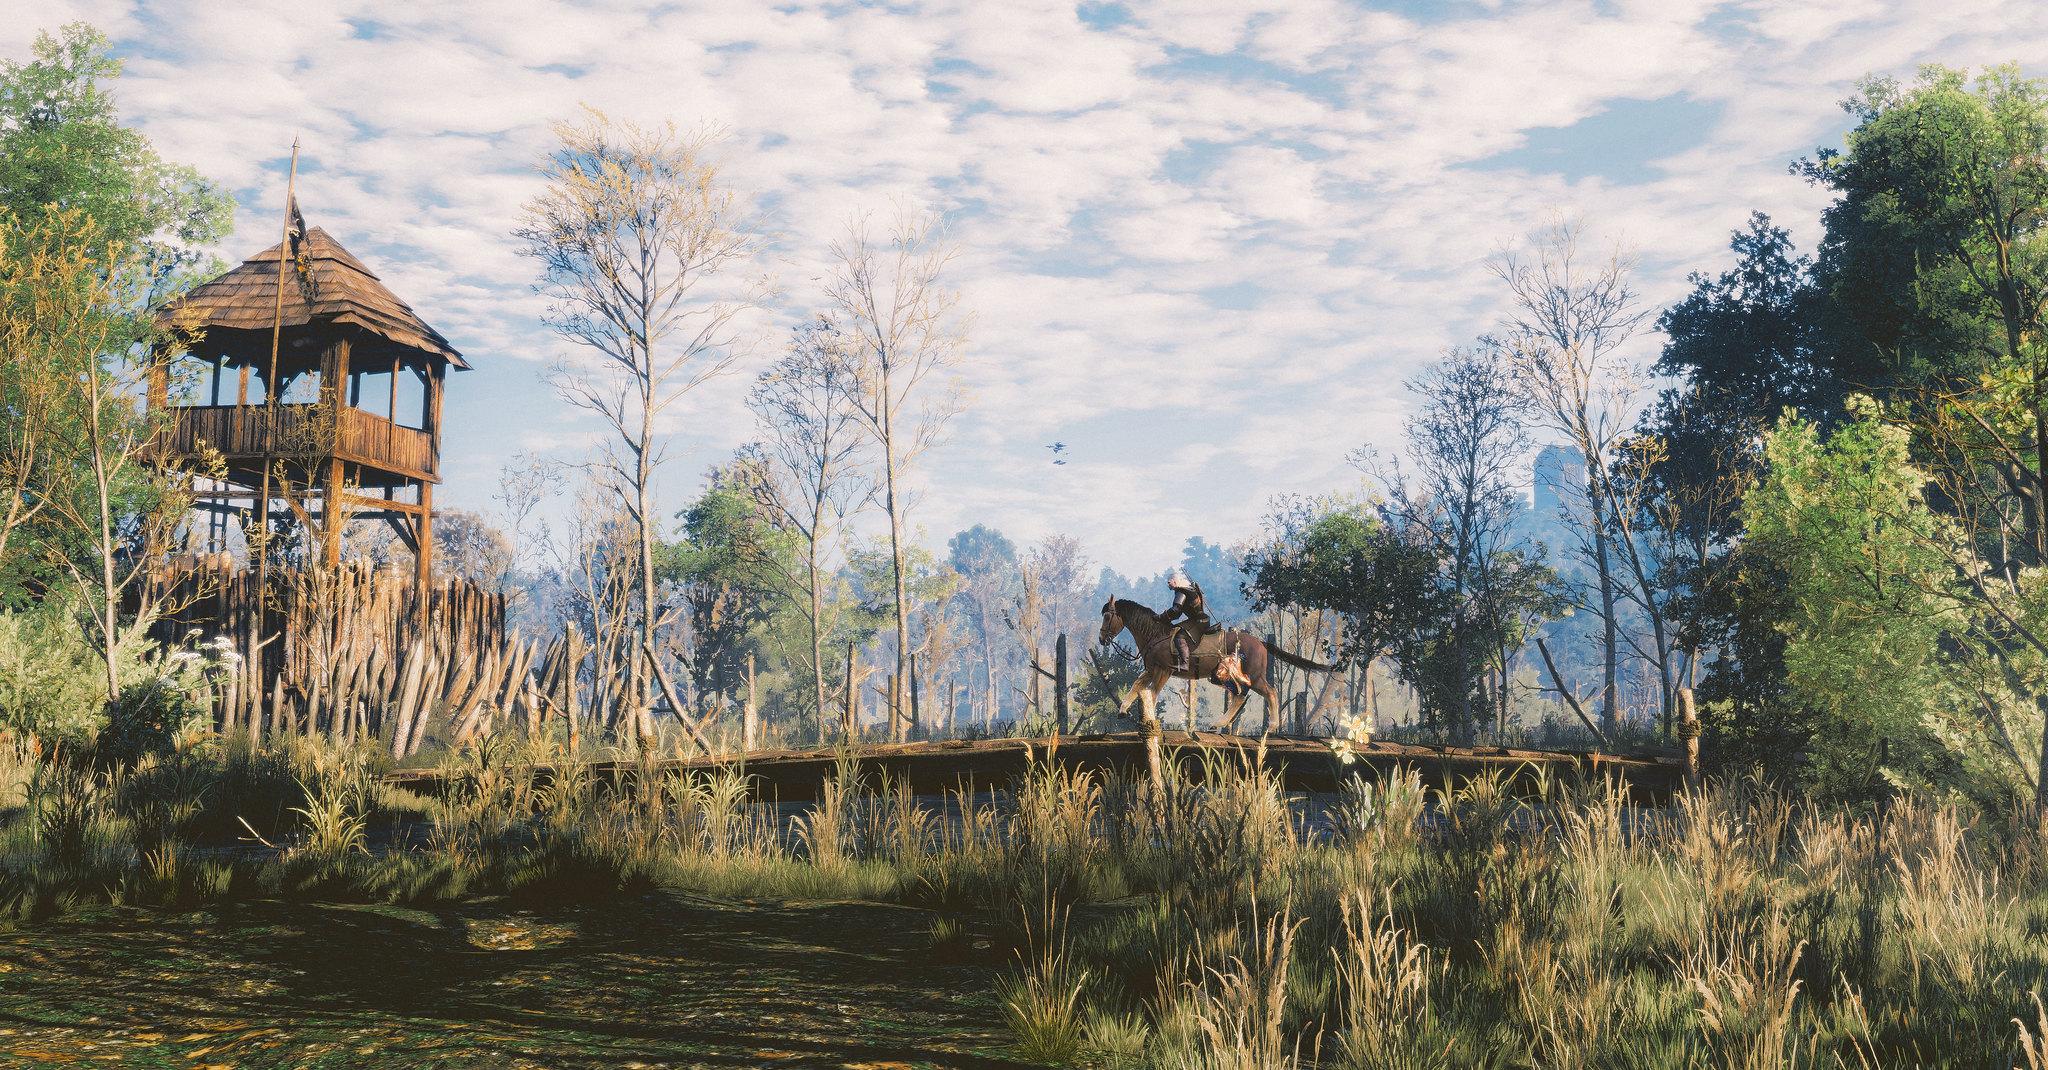 19199181511_77e67d845f_k.jpg - The Witcher 3: Wild Hunt